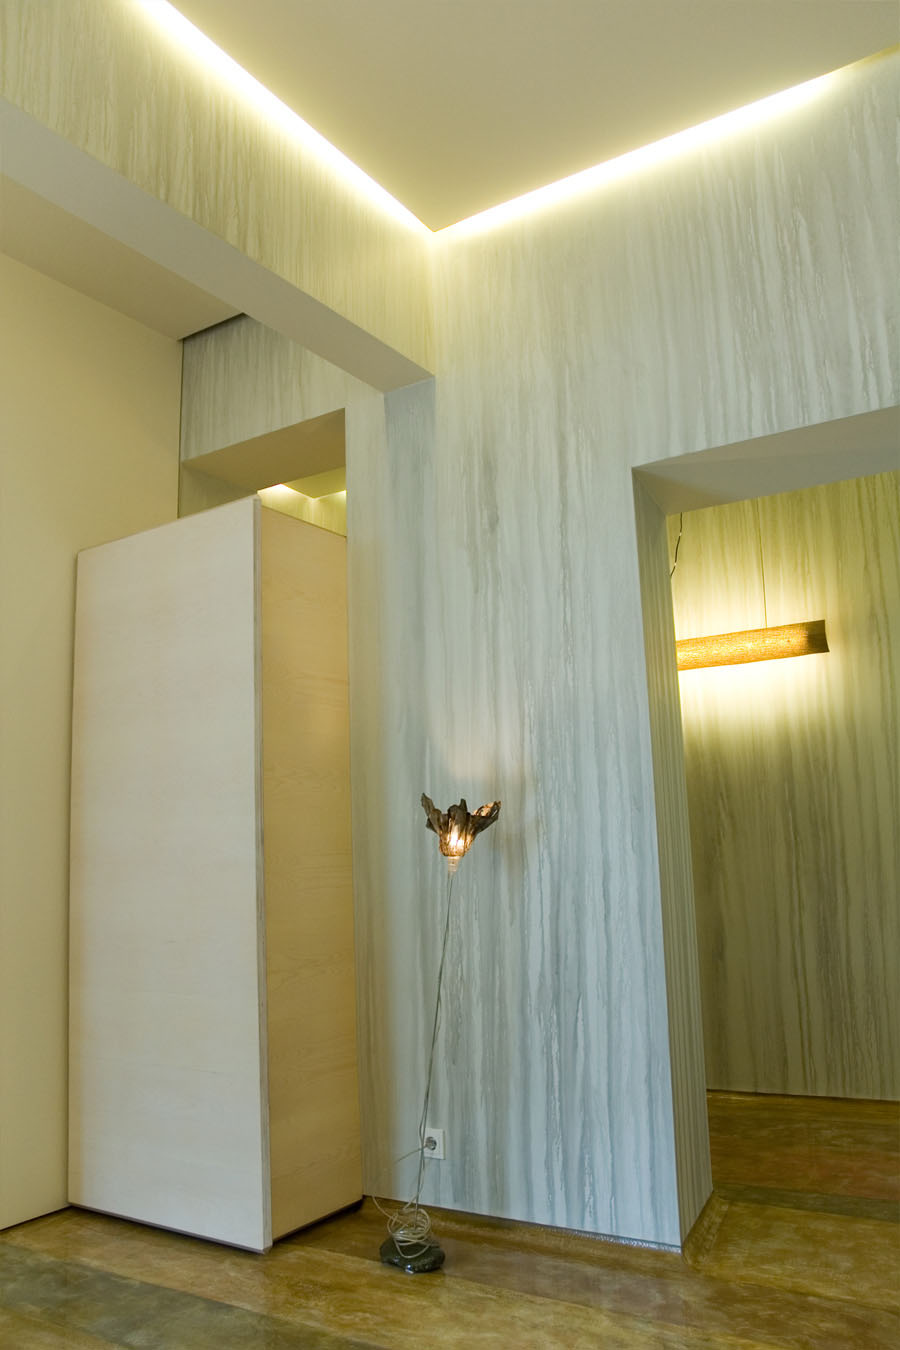 Freydenberg_Apartment_Hotel_23.jpg